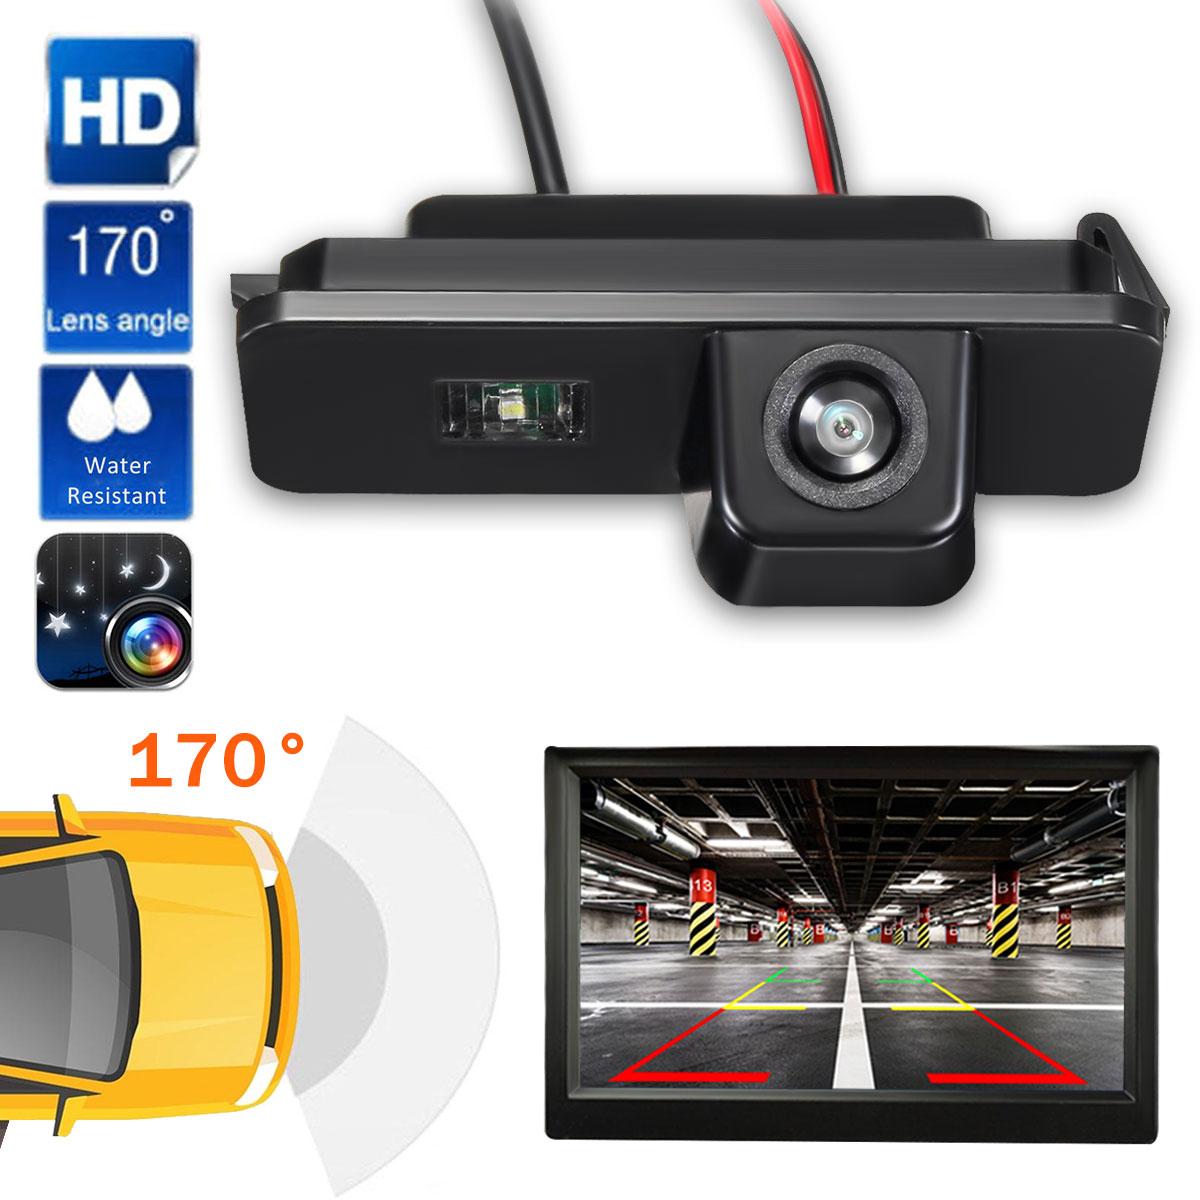 Universal Car Rear View Reverse Camera For VW For Polo 2C Bora Golf MK4 MK5 MK6 Beetle Leon Backup Rearview Parking